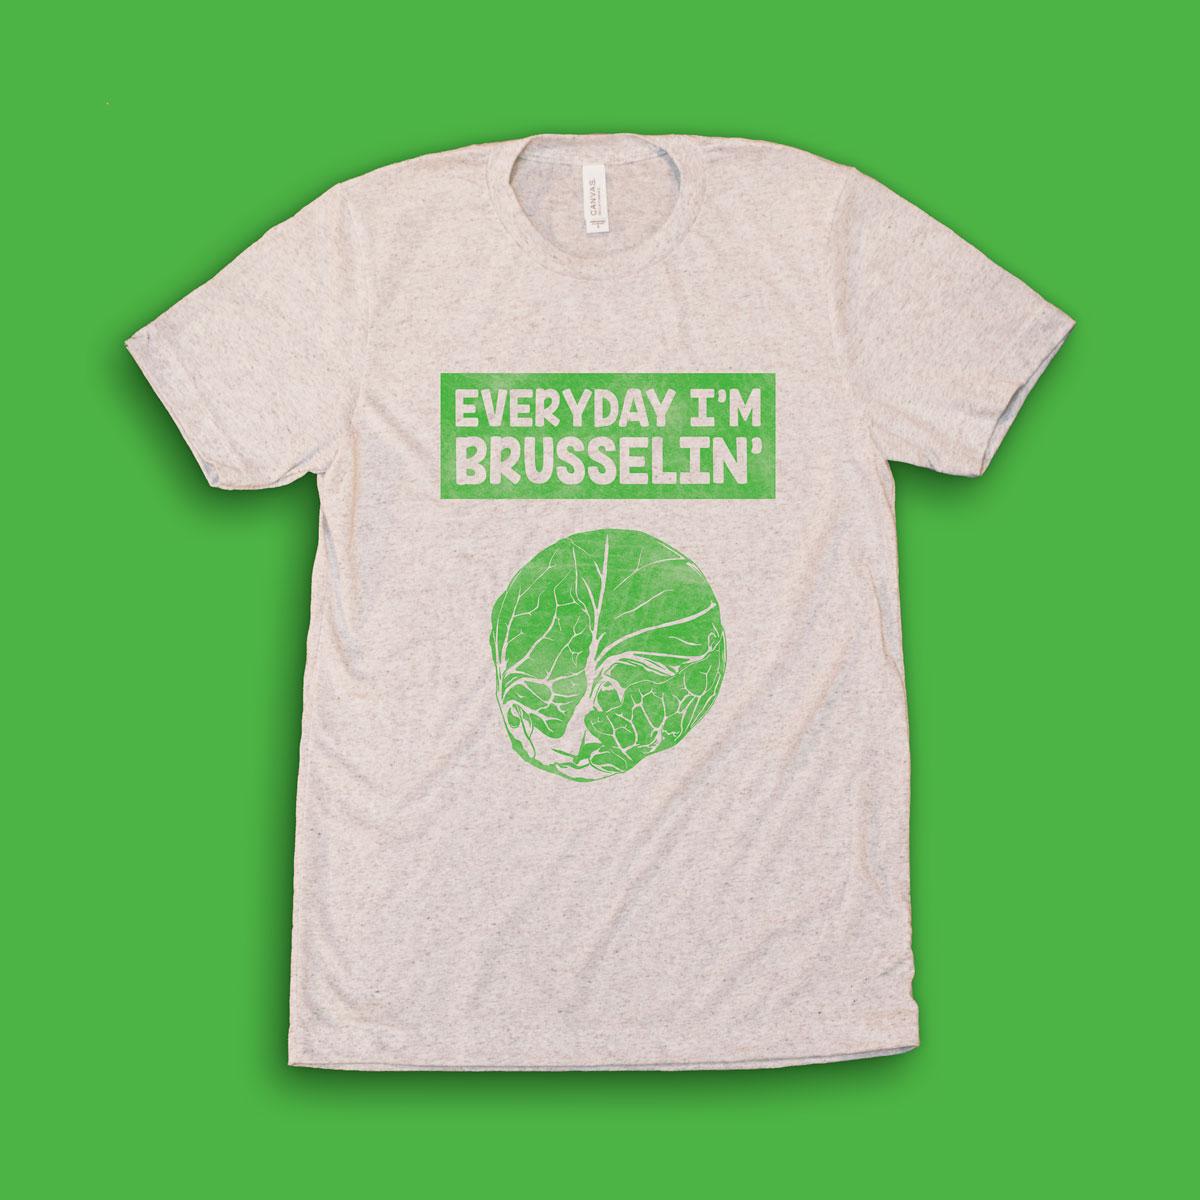 Planty-Good_Vegan-Clothing_Everyday-I'm-Brusselin'_Tee_front.jpg